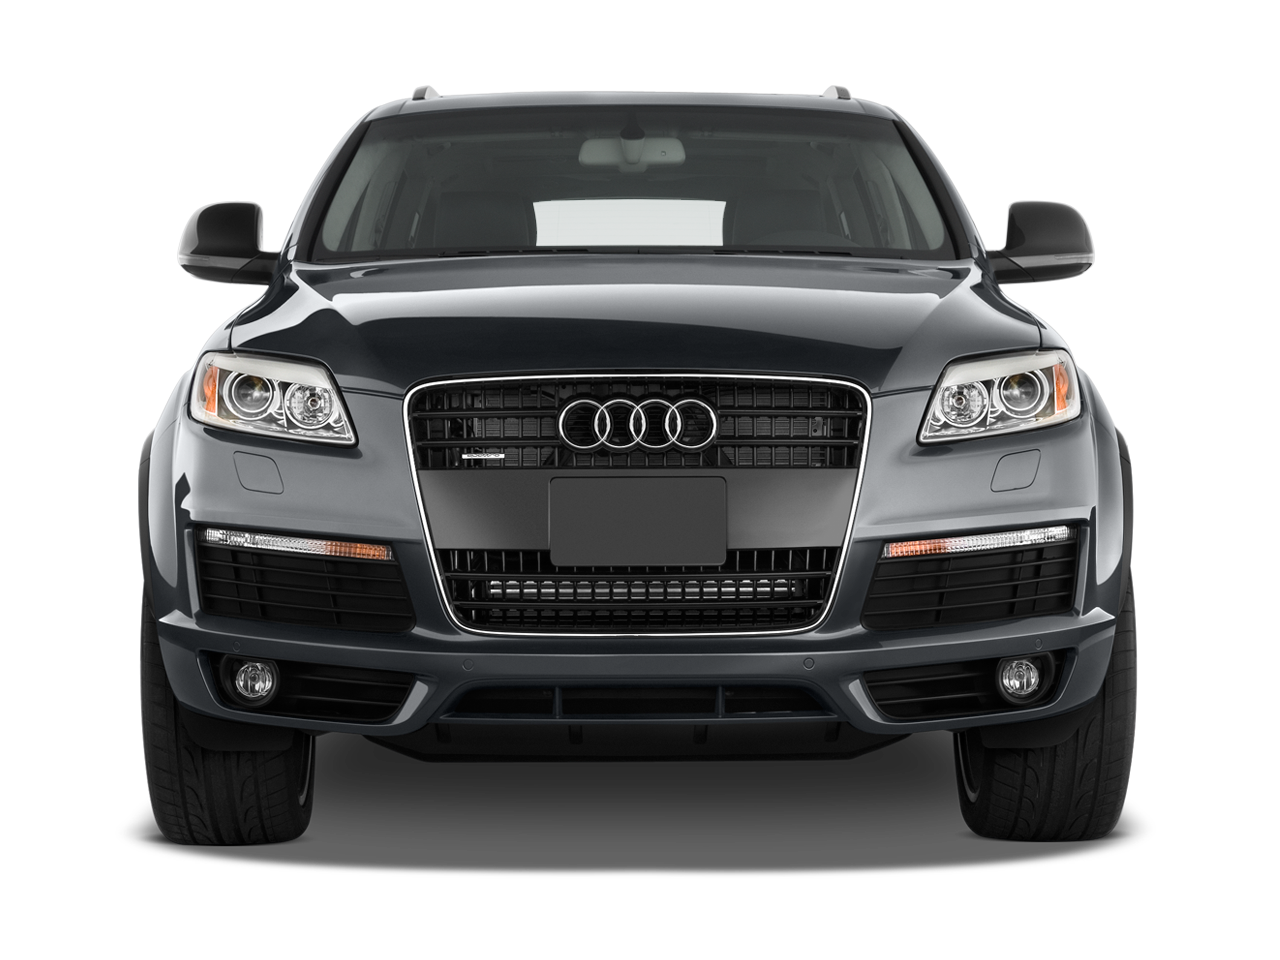 2009 Audi Q7 3 0 Tdi Quattro Fuel Efficient News Car